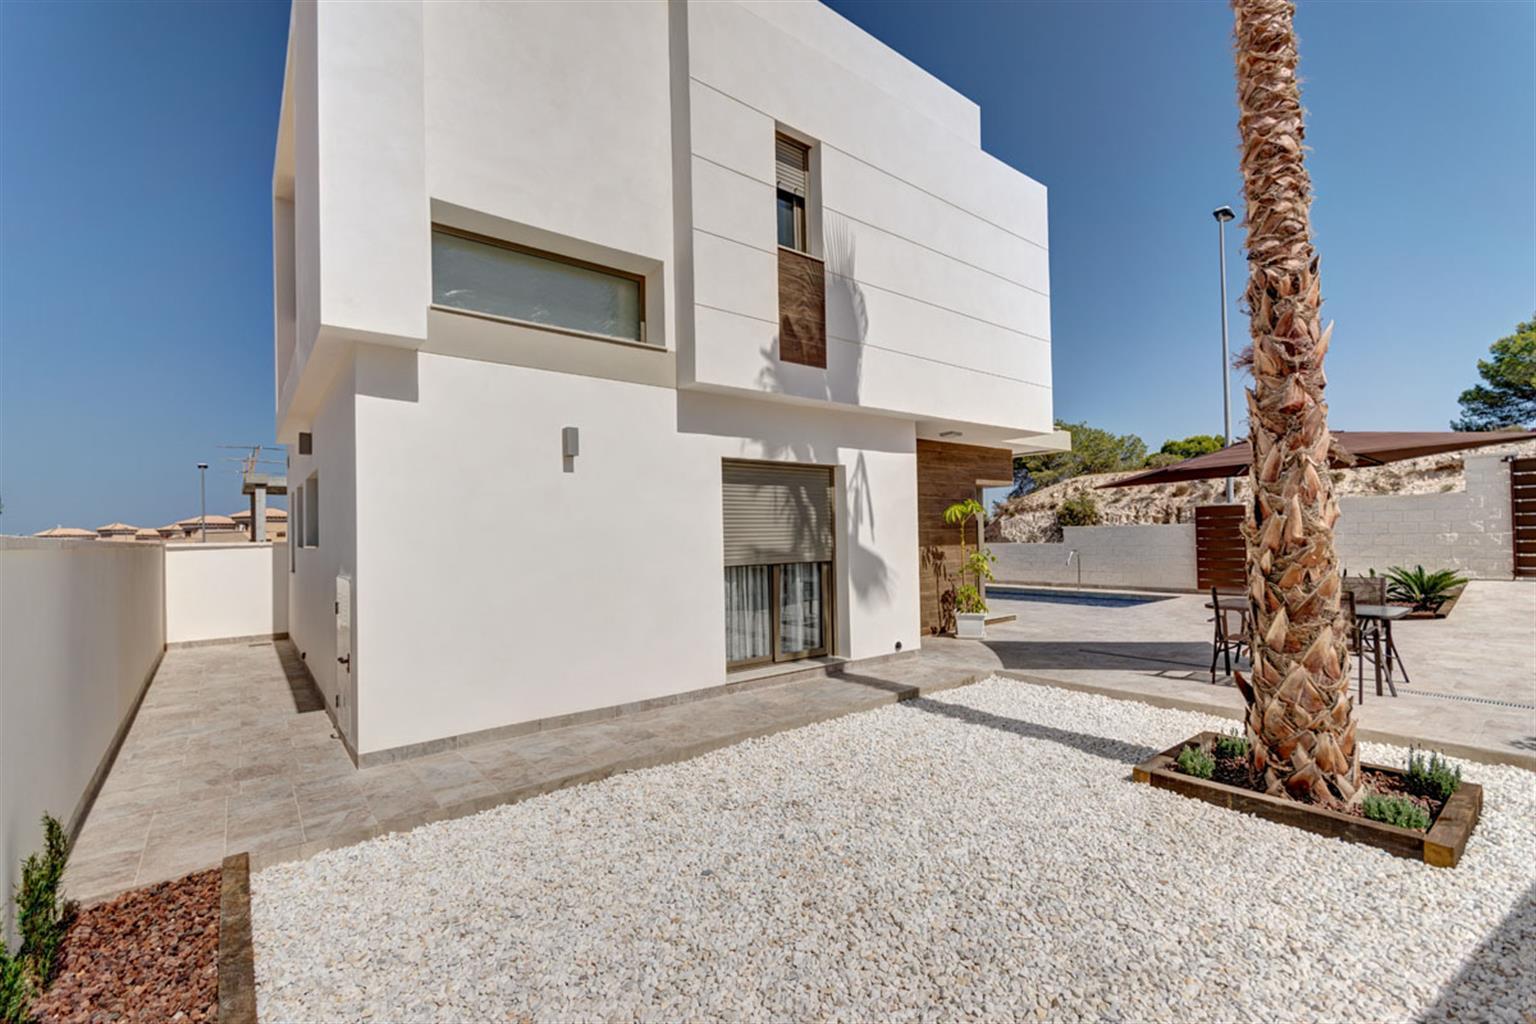 Maison - San Miguel De Salinas - #4227968-1